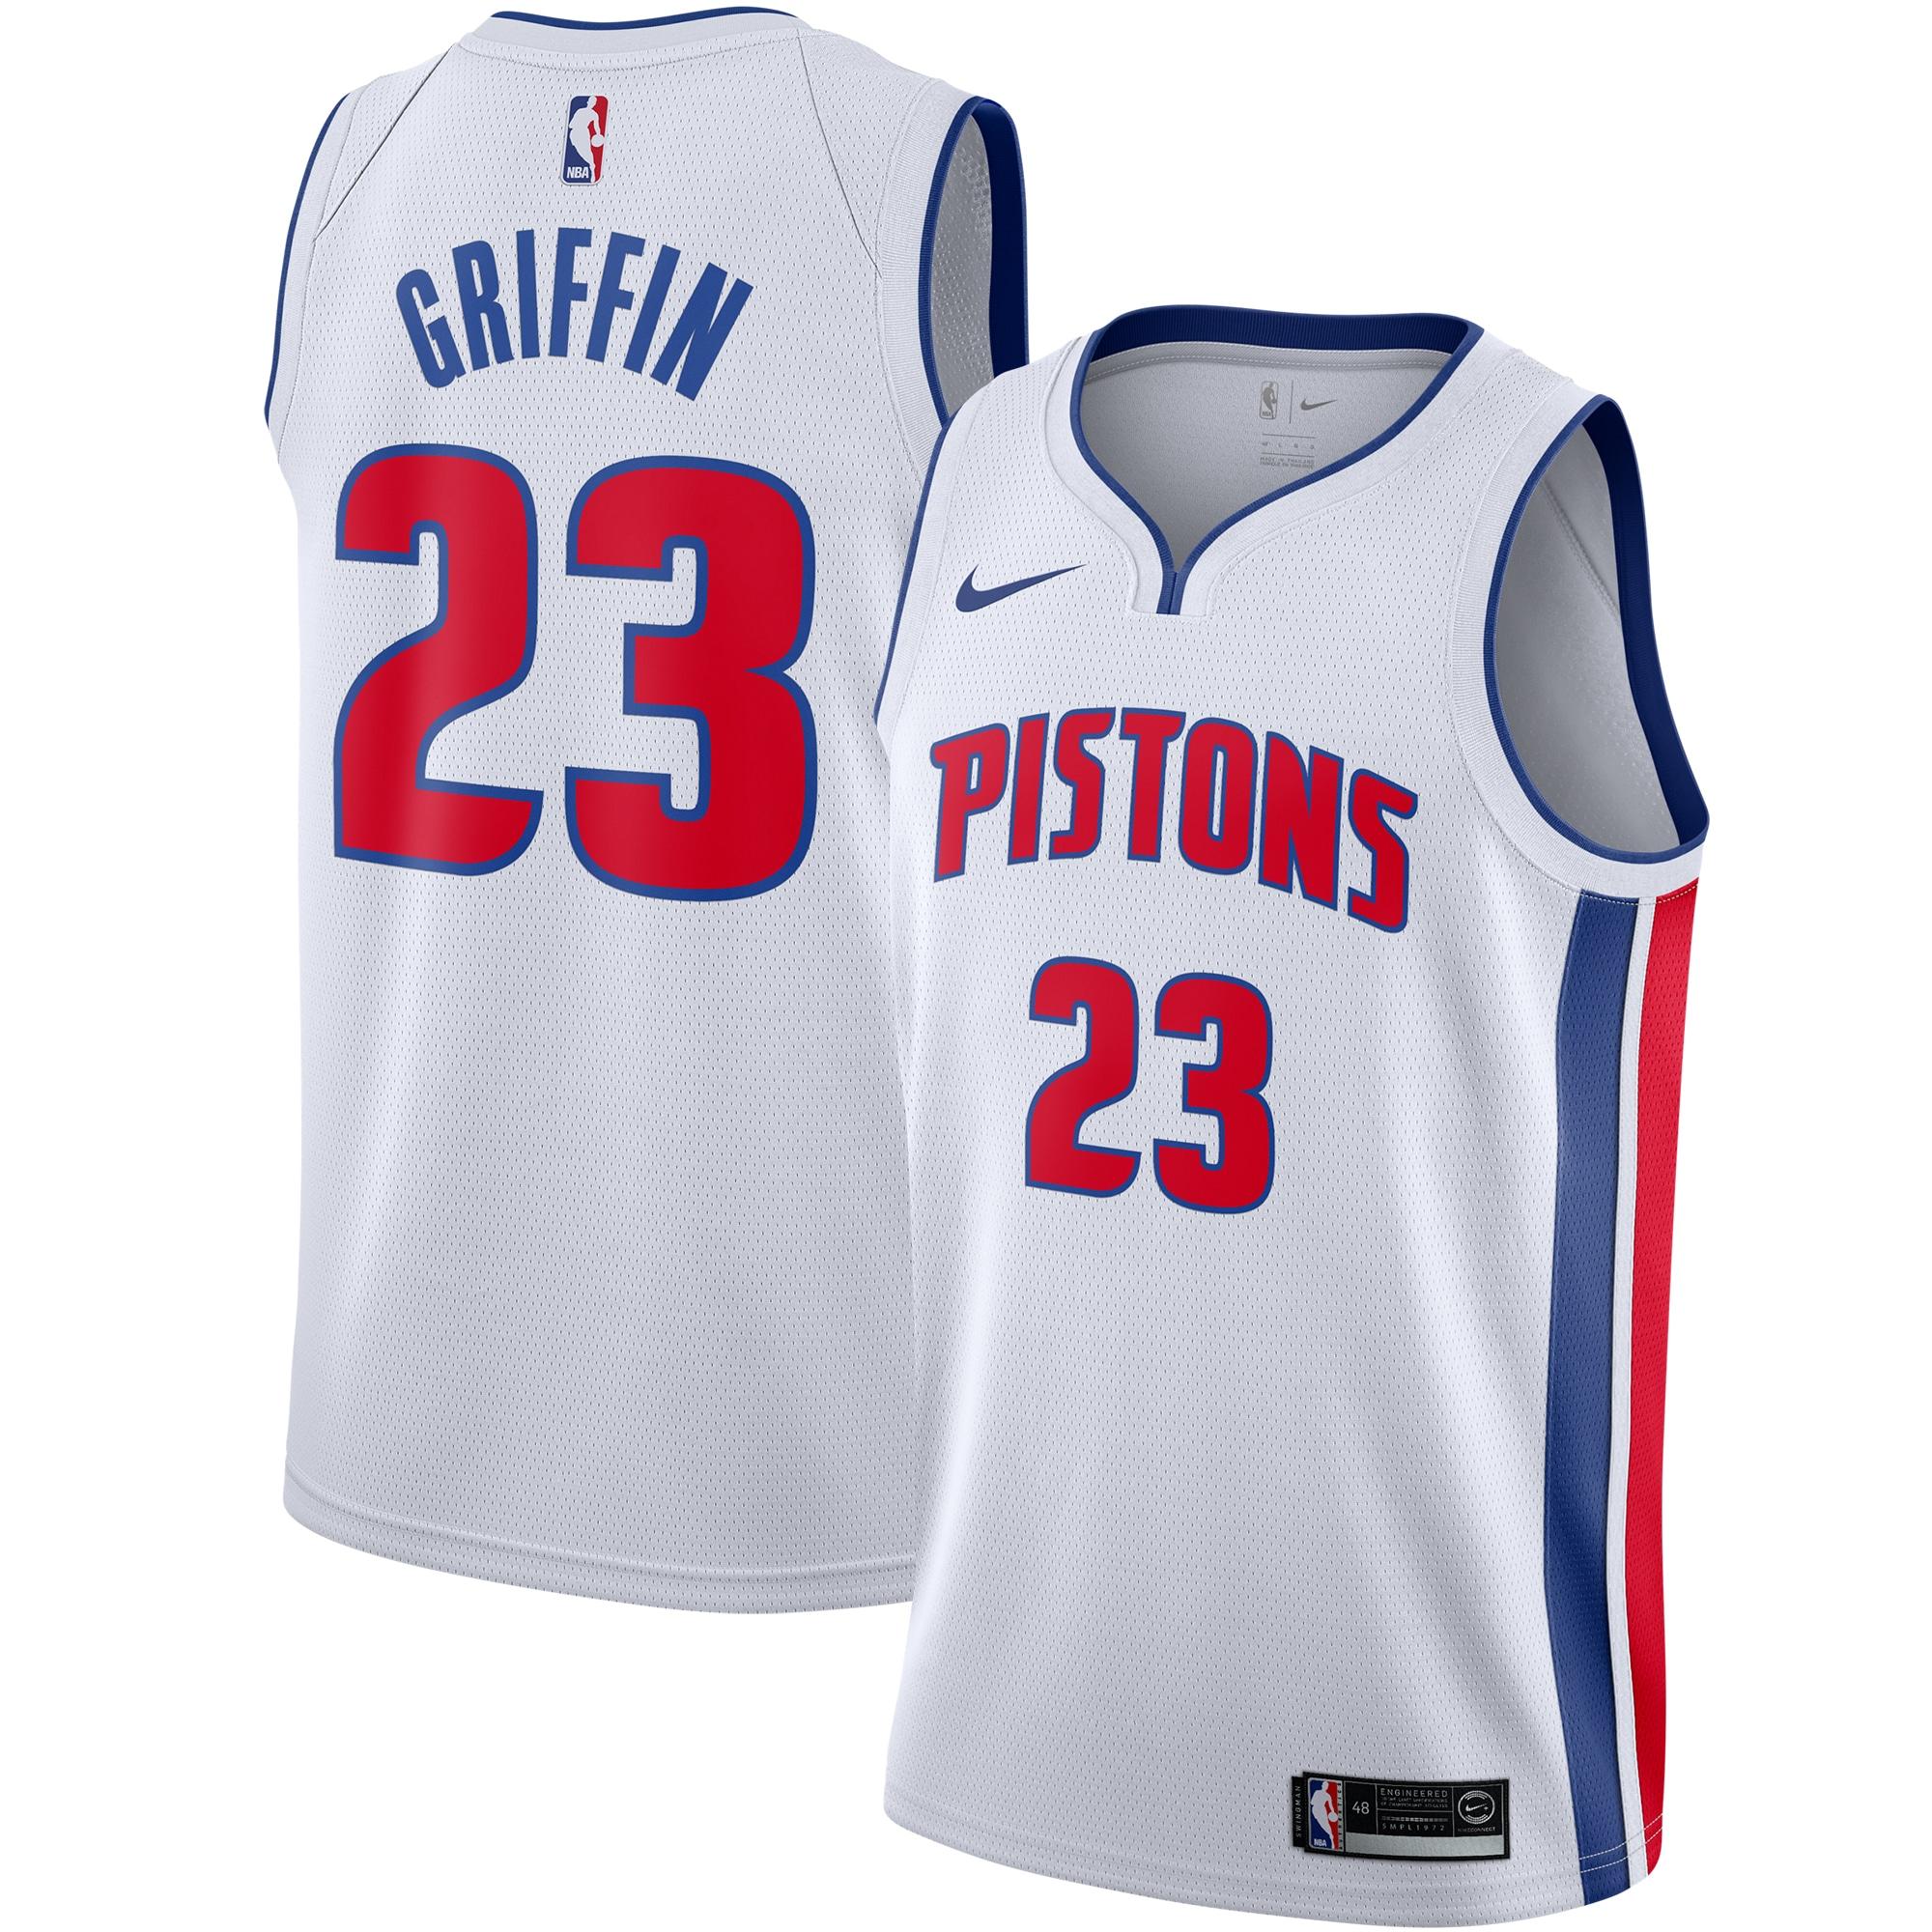 Blake Griffin Detroit Pistons Nike Youth Swingman Jersey - White - Icon Edition